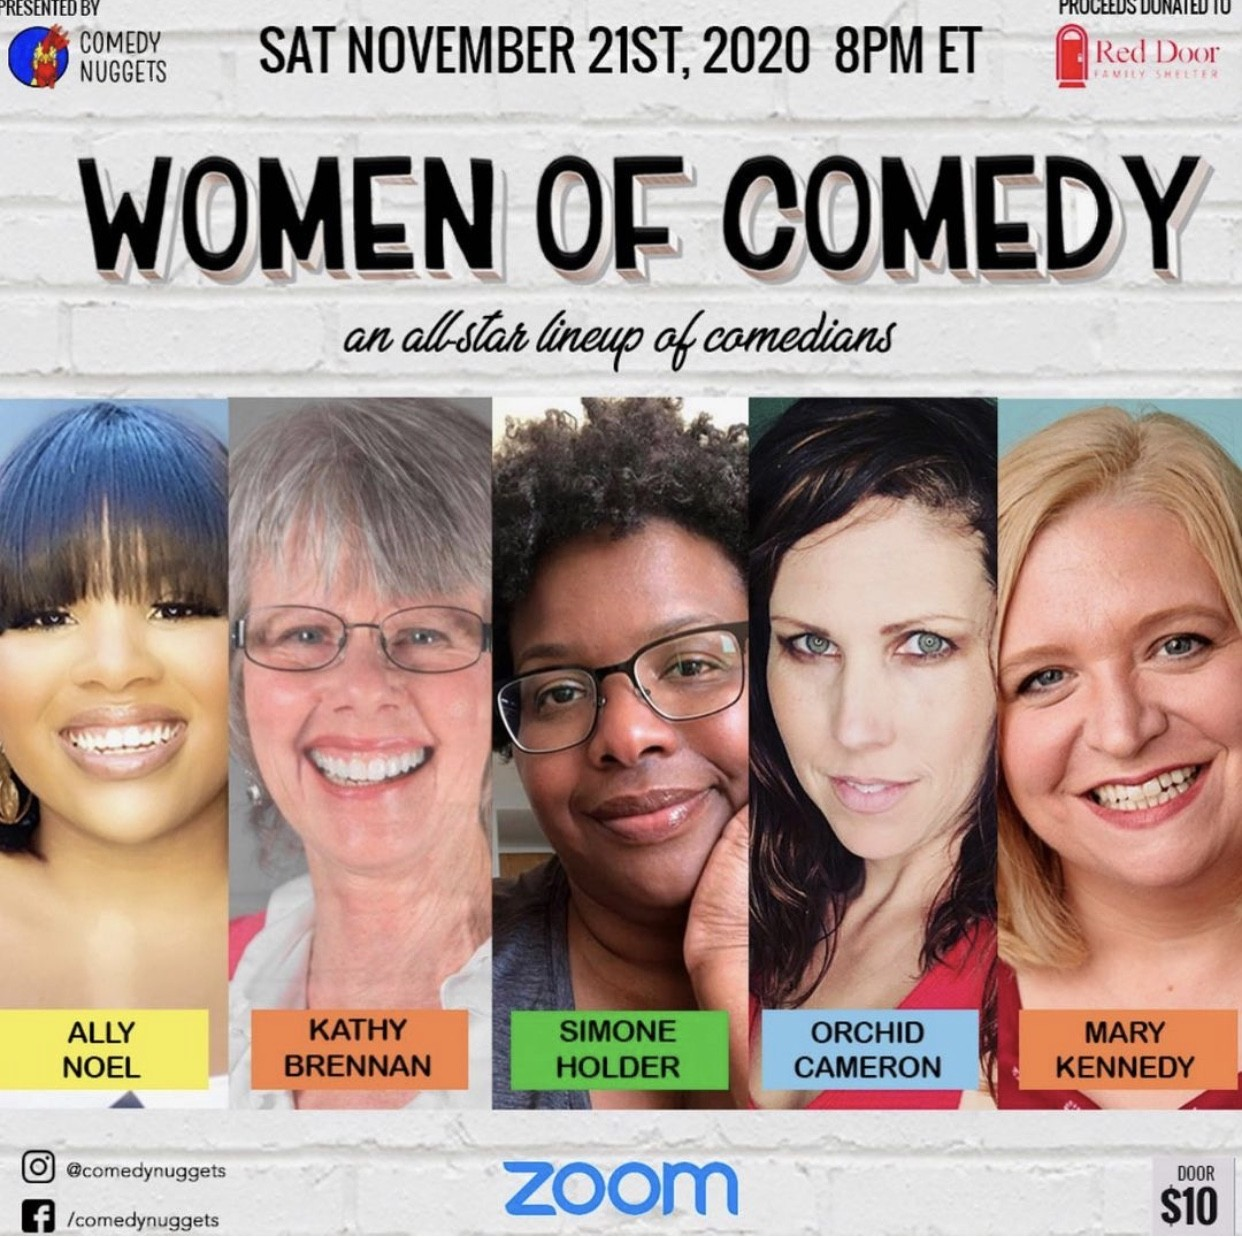 Women of Comedy (Zoom) - November 21, 2020